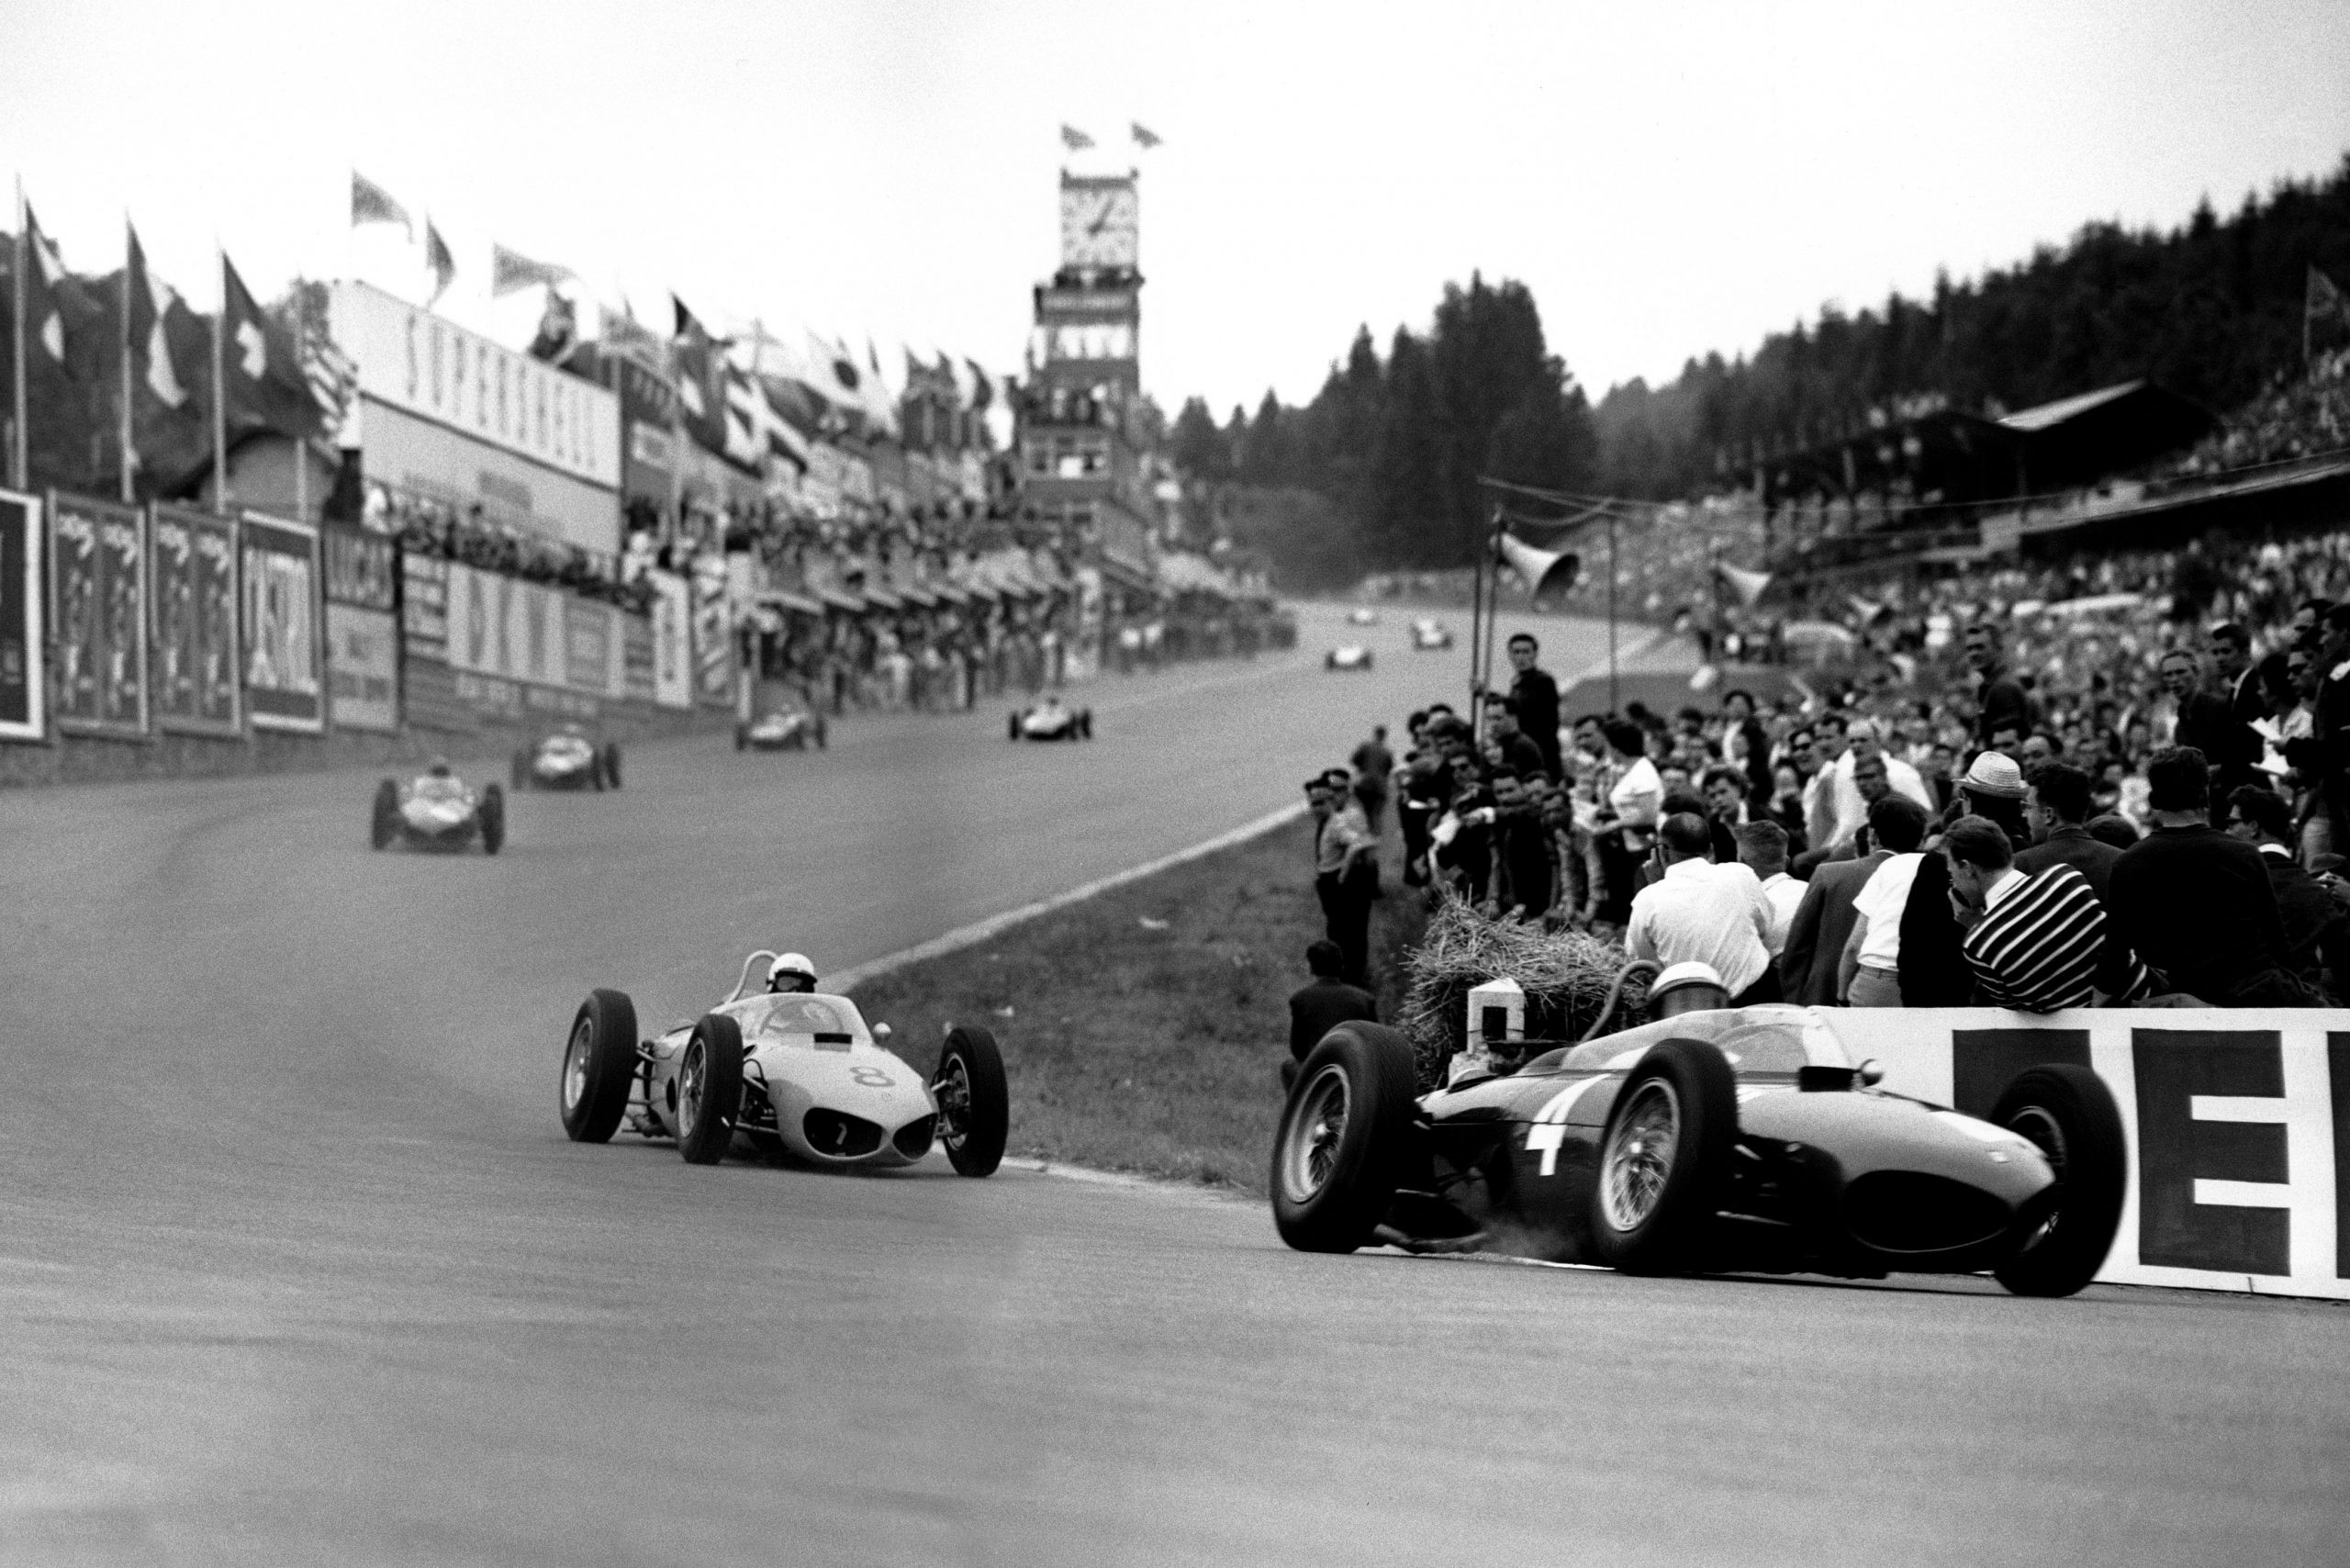 Phil Hill leads Olivier Gendebien, both in Ferrari 156s.